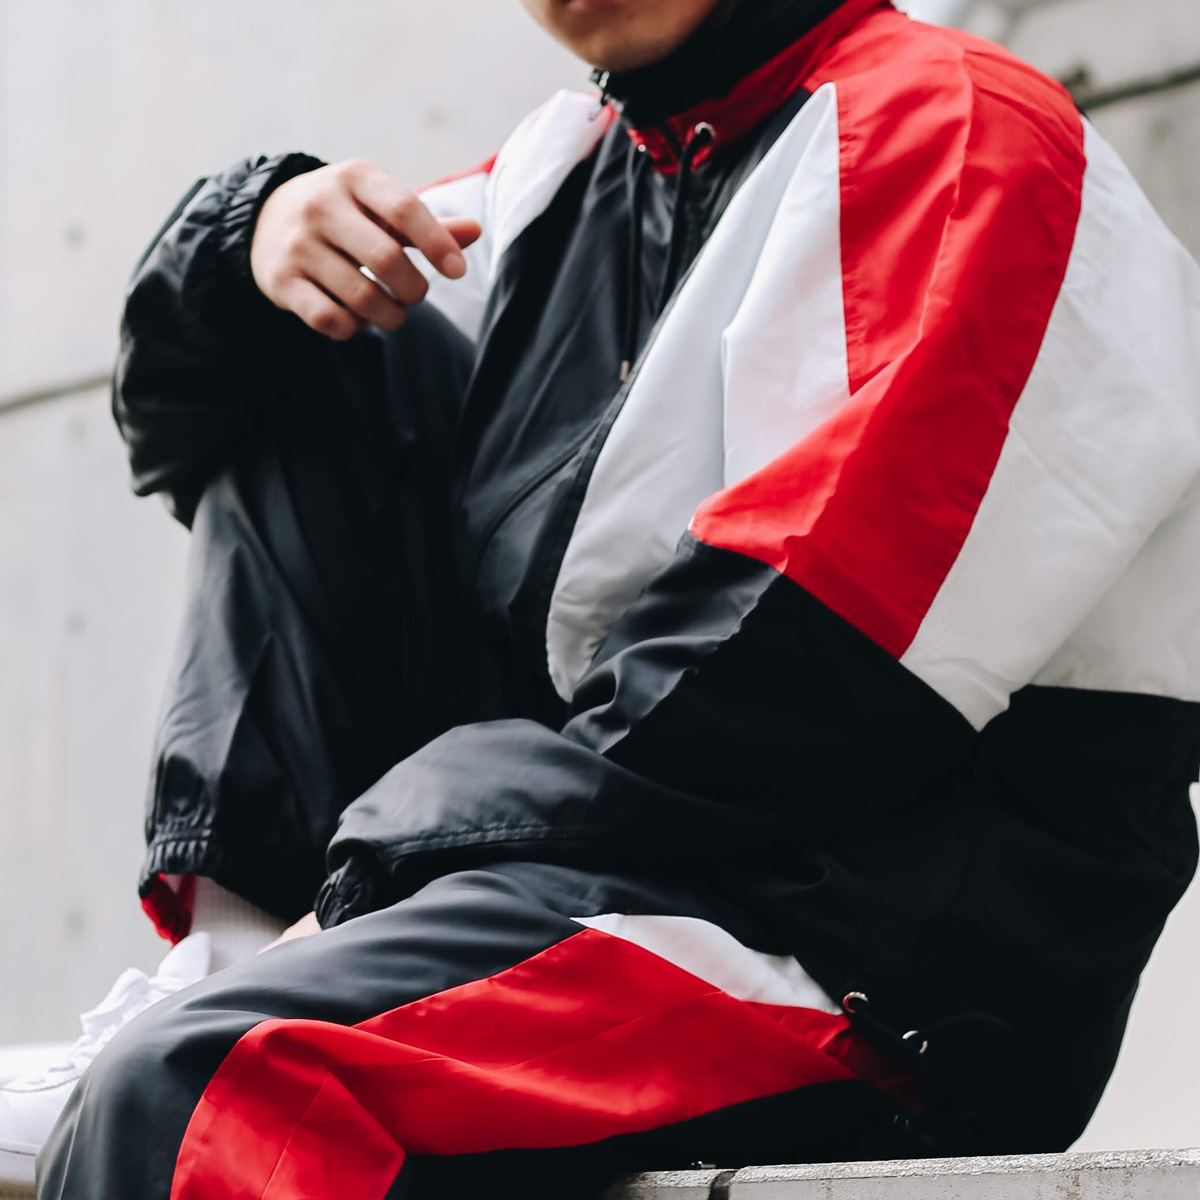 NIKE AS M NSW RE-ISSUE JKT WVN(ナイキ リ イシュー ウーブン ジャケット)BLACK/UNIVERSITY RED/SUMMIT WHITE/BLACK【メンズ ジャケット】18HO-I